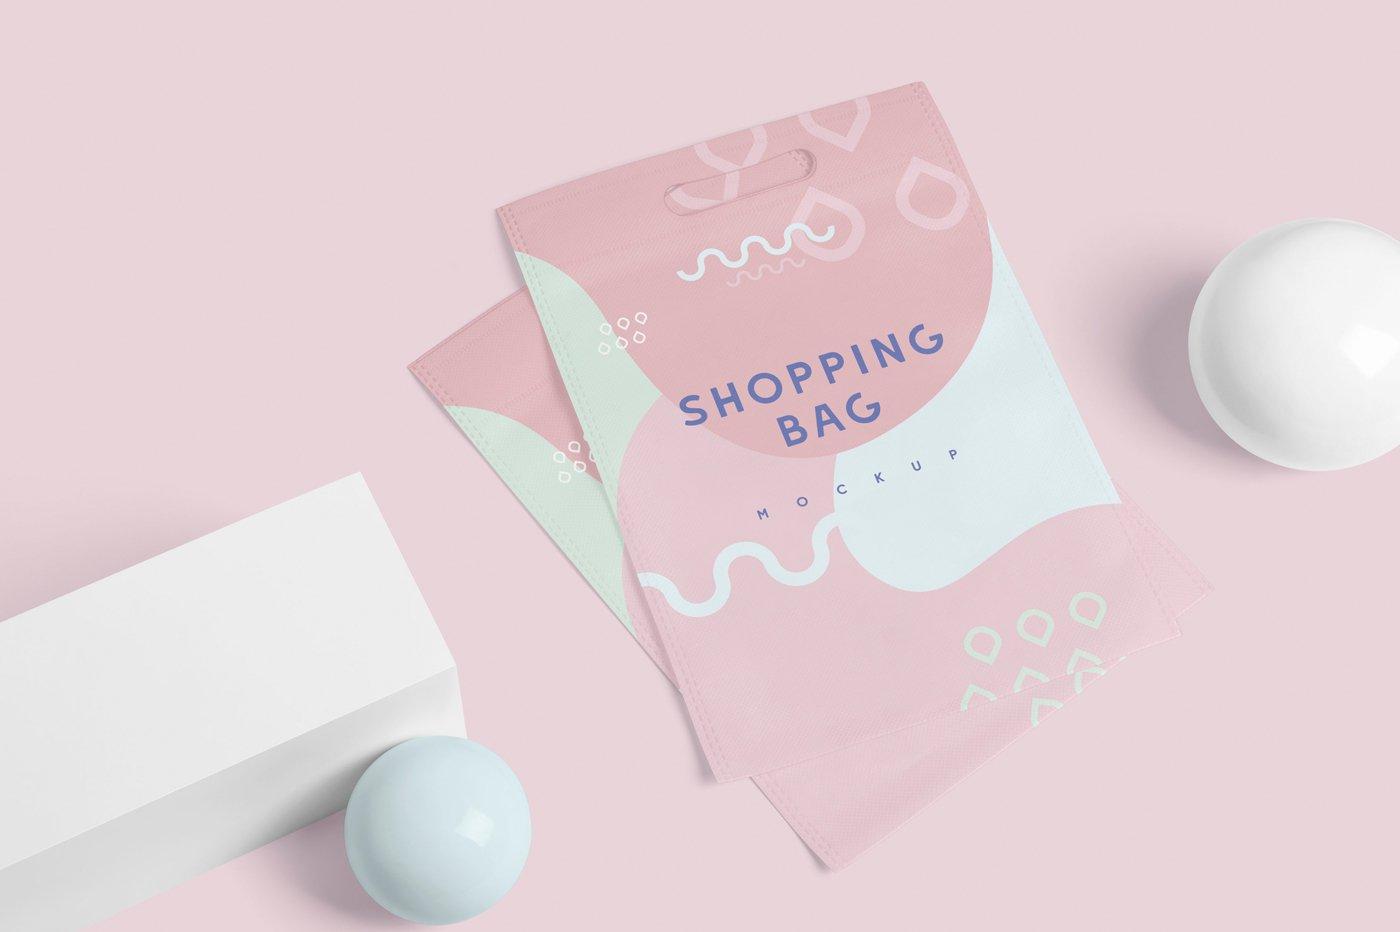 矩形帆布购物袋设计展示样机 Rectangle Canvas Shopping Bag Mockups插图(1)